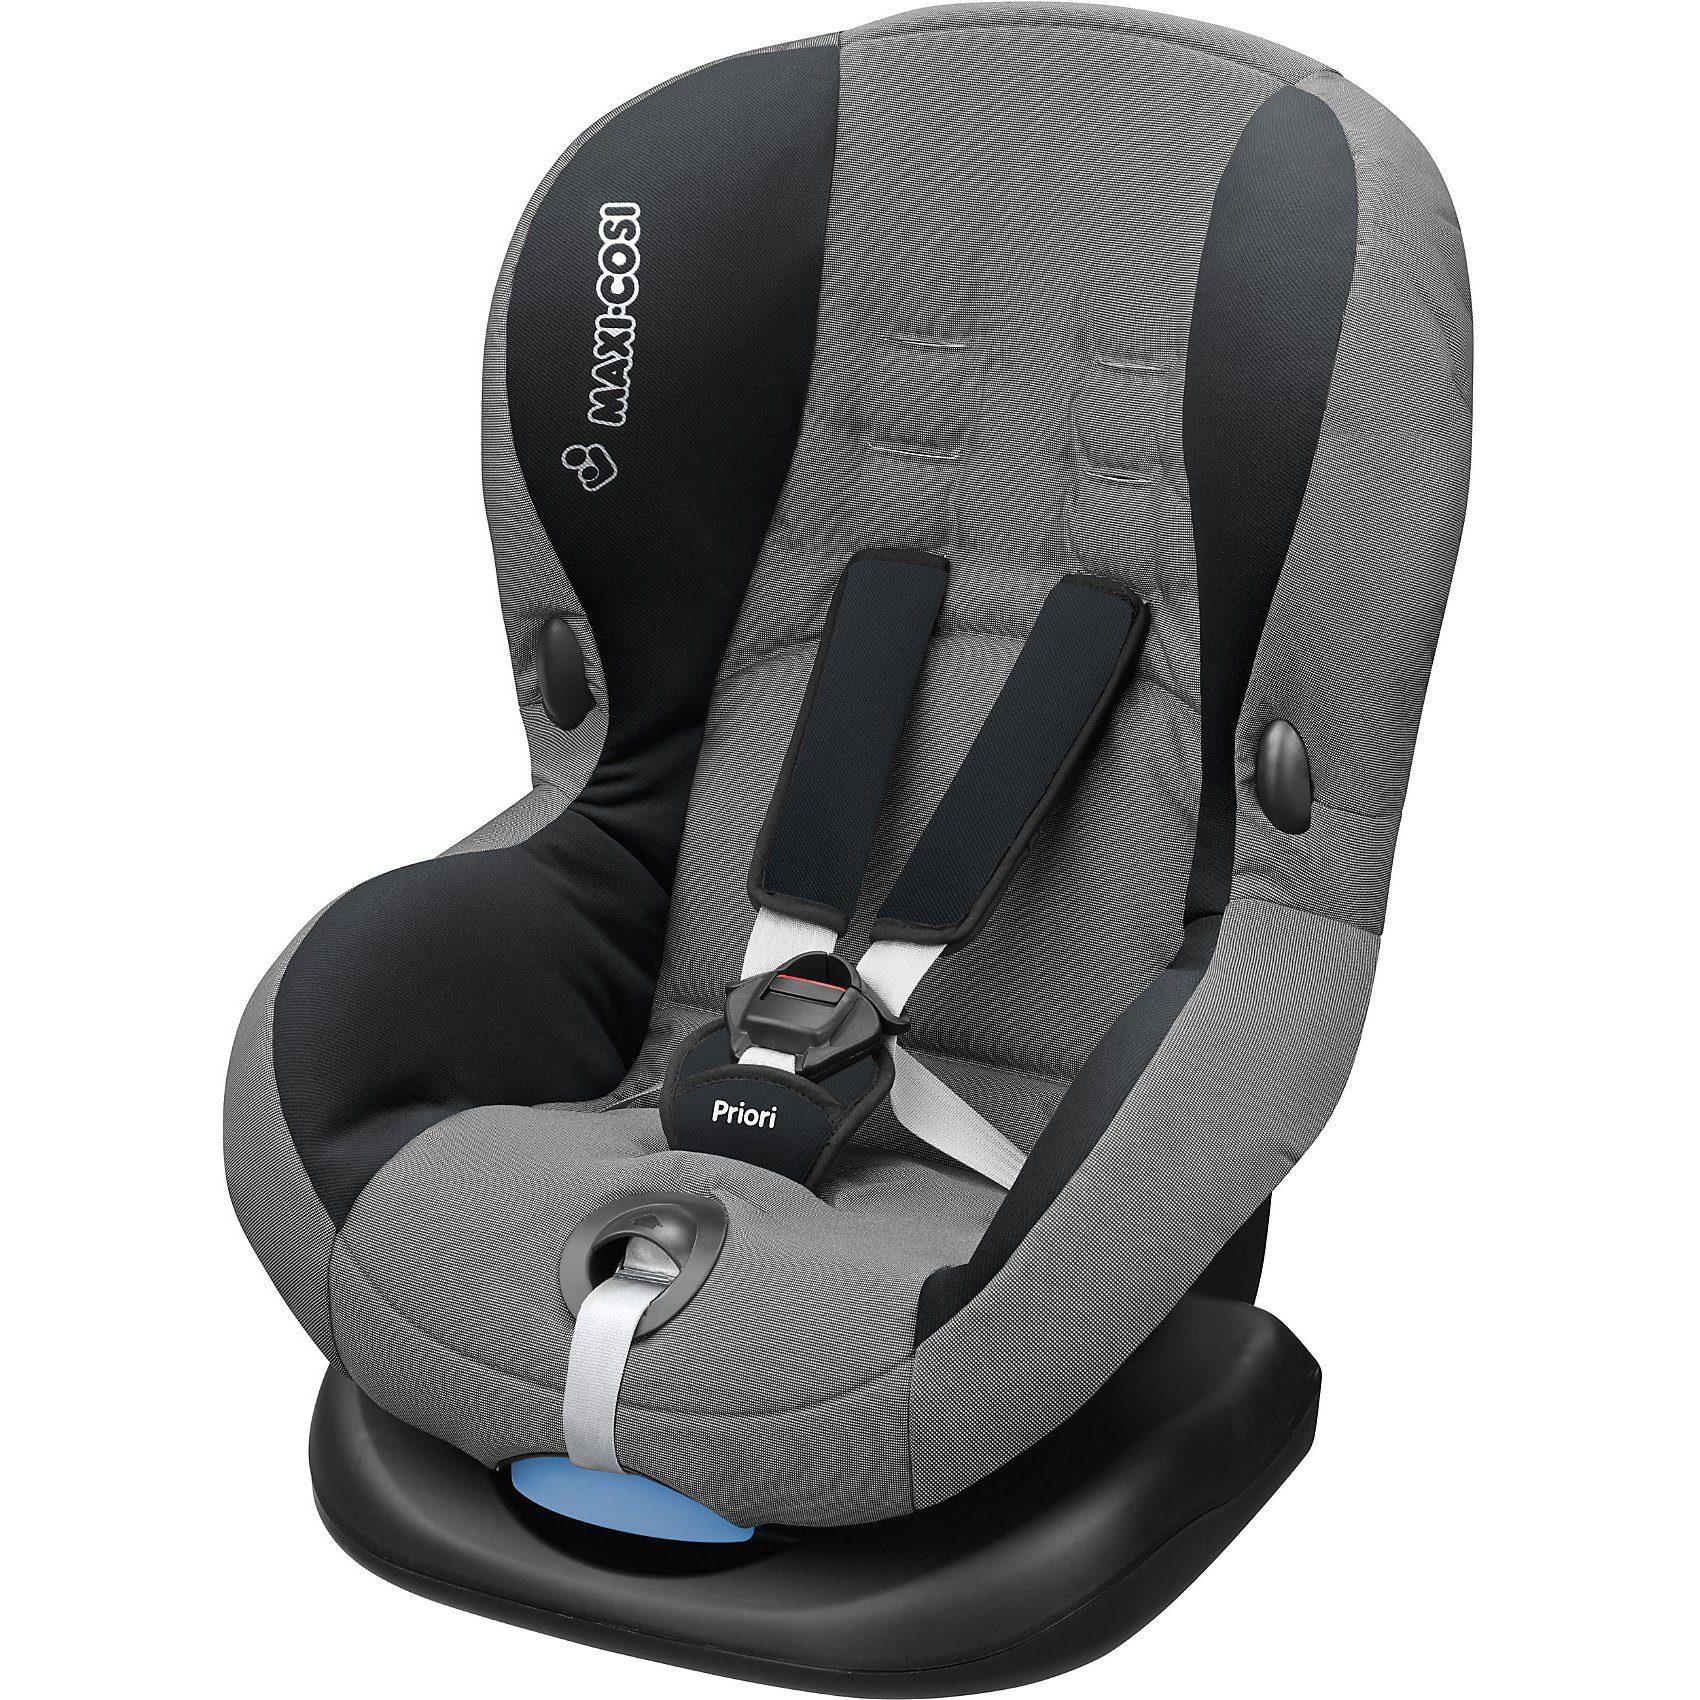 Maxi-Cosi Auto-Kindersitz Priori SPS Plus, Björn, 2016